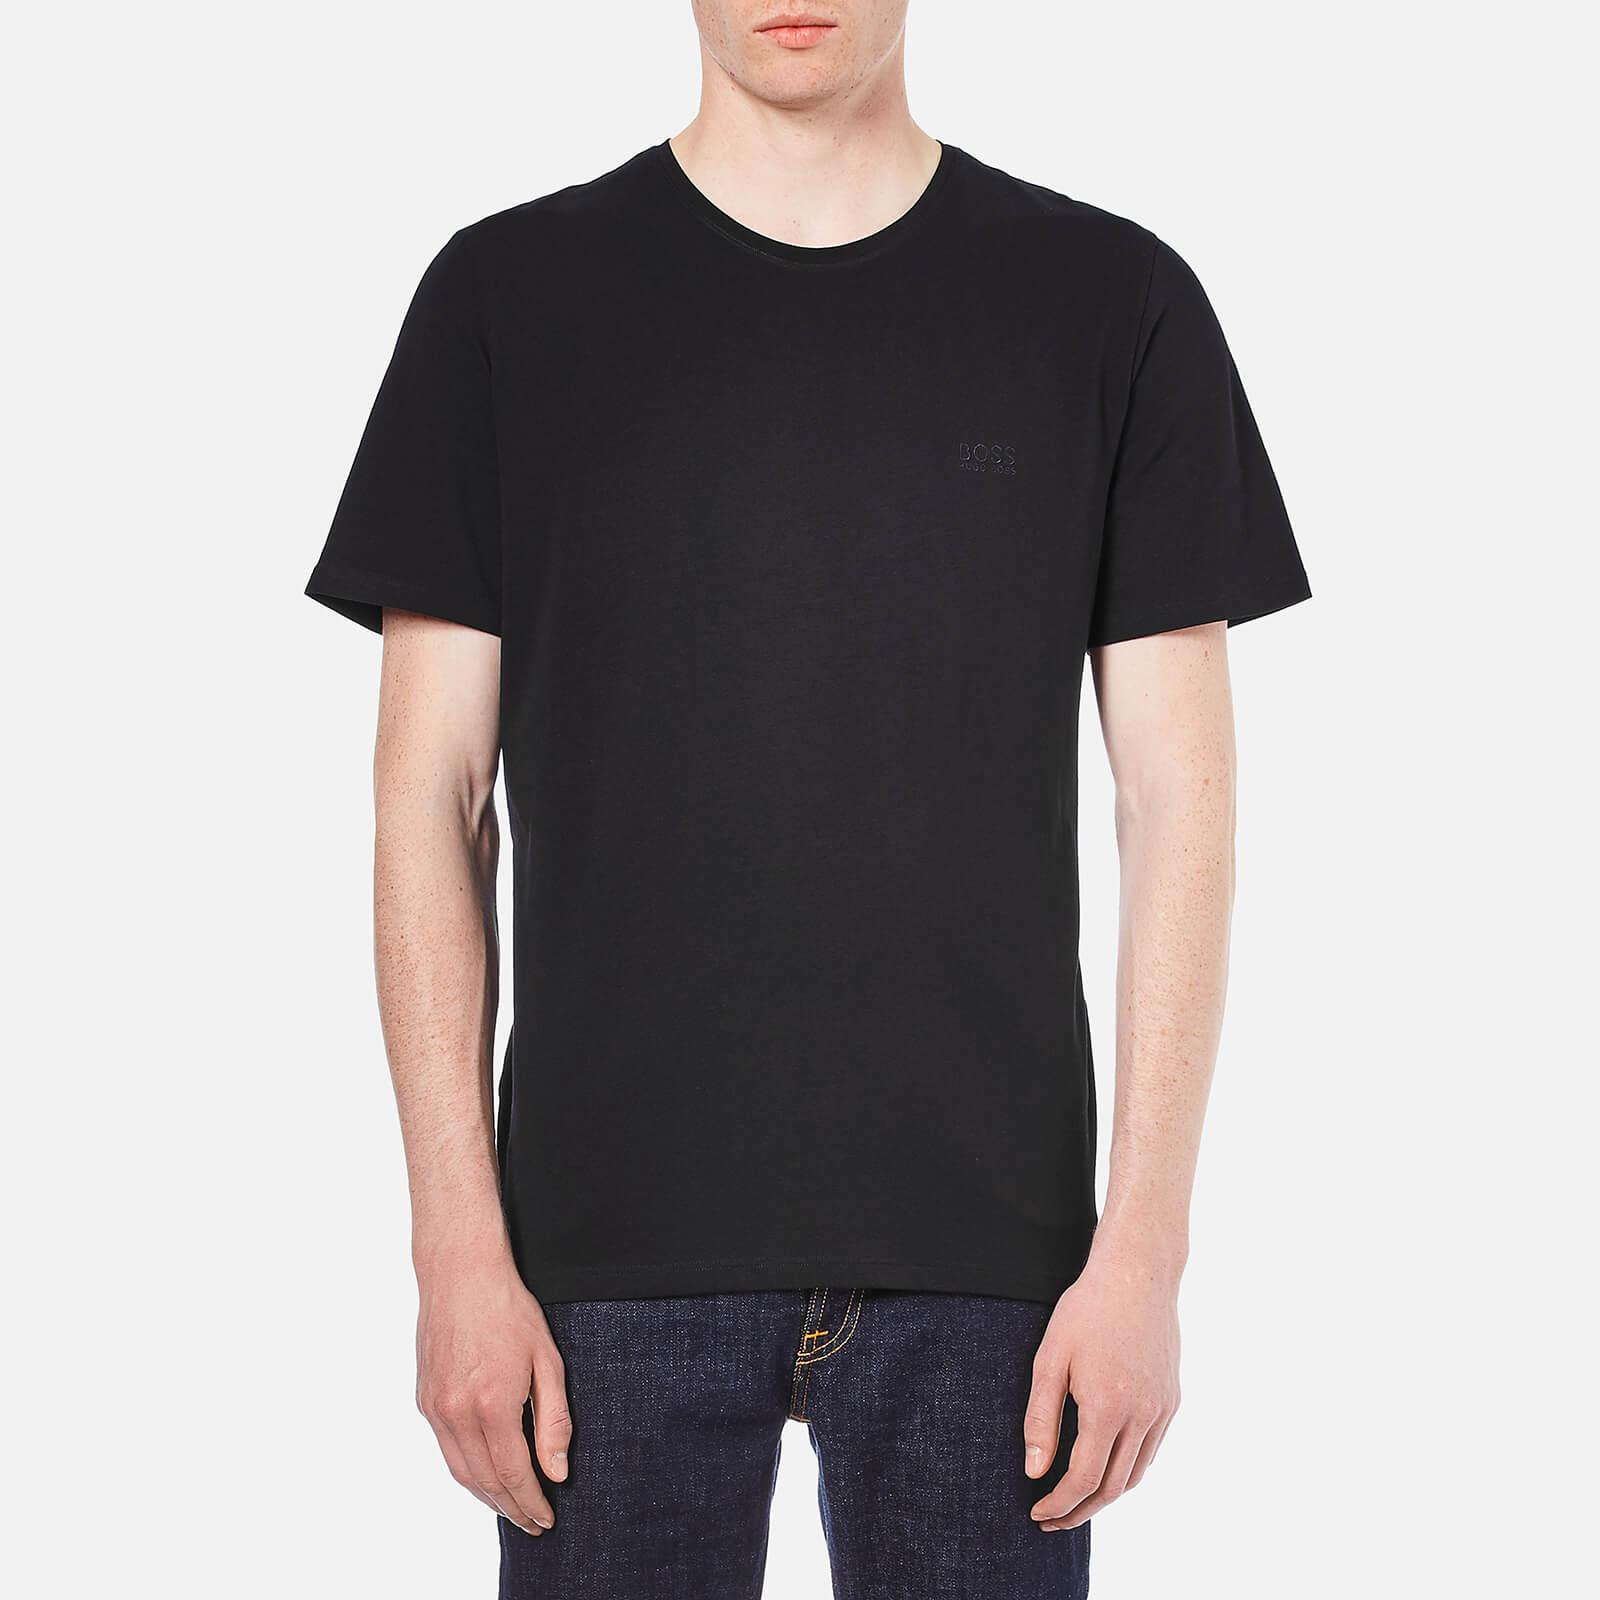 e3ef864823 BOSS Hugo Boss Men's Crew Neck Small Logo T-Shirt - Black Clothing |  TheHut.com